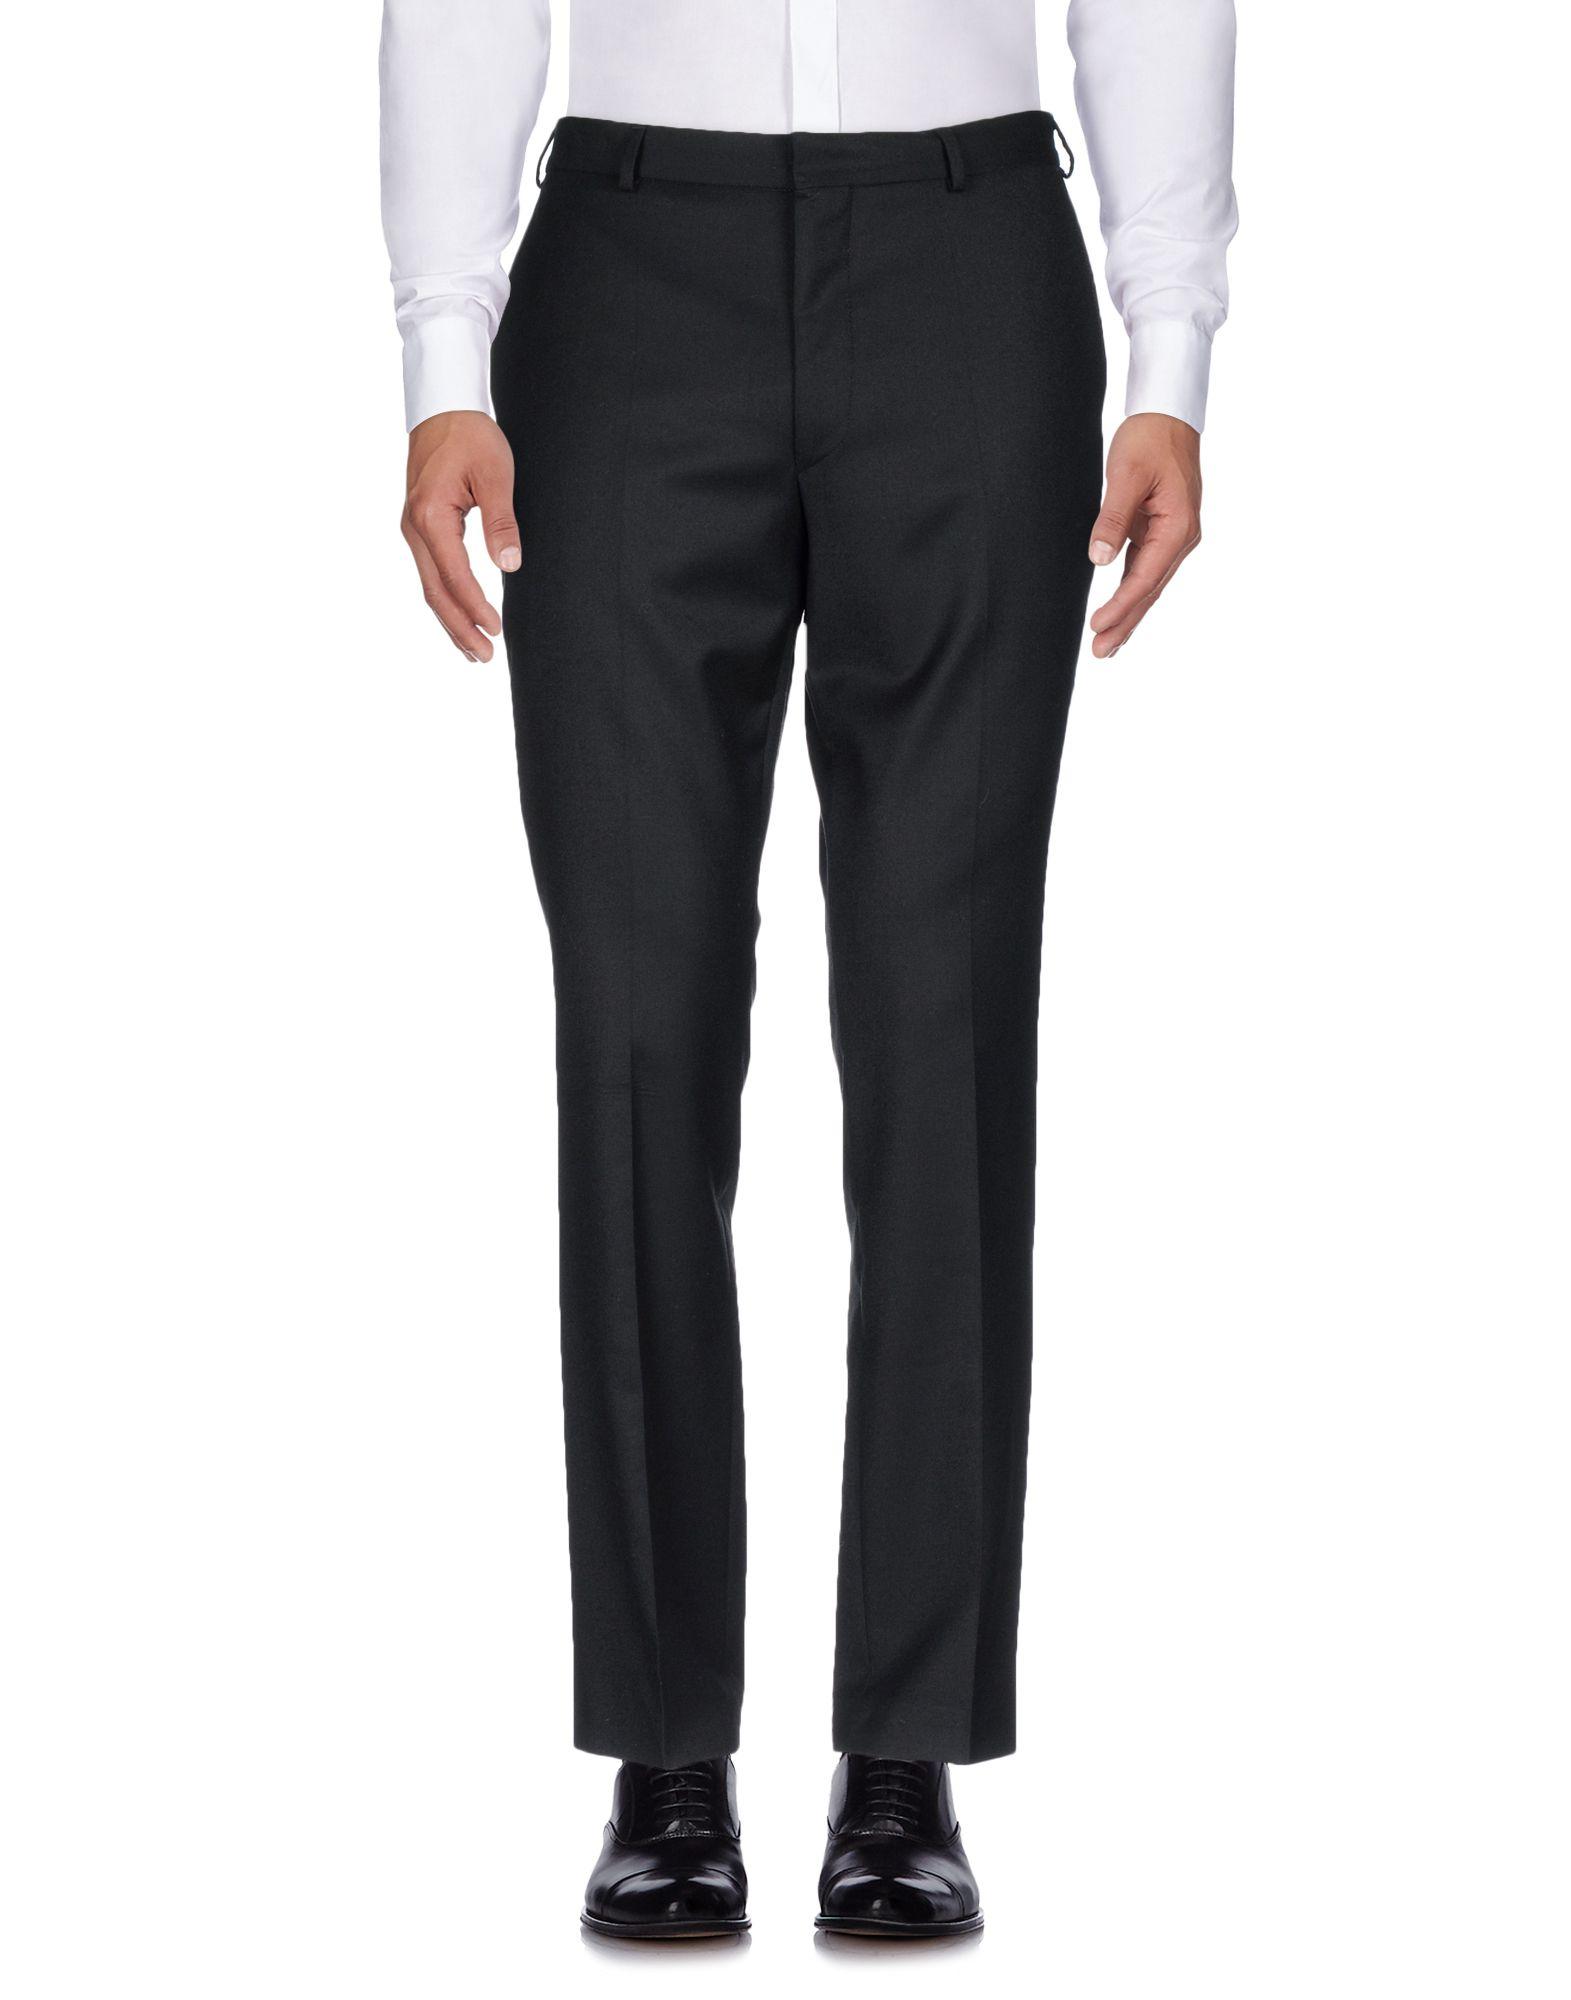 все цены на A KIND OF GUISE Повседневные брюки онлайн